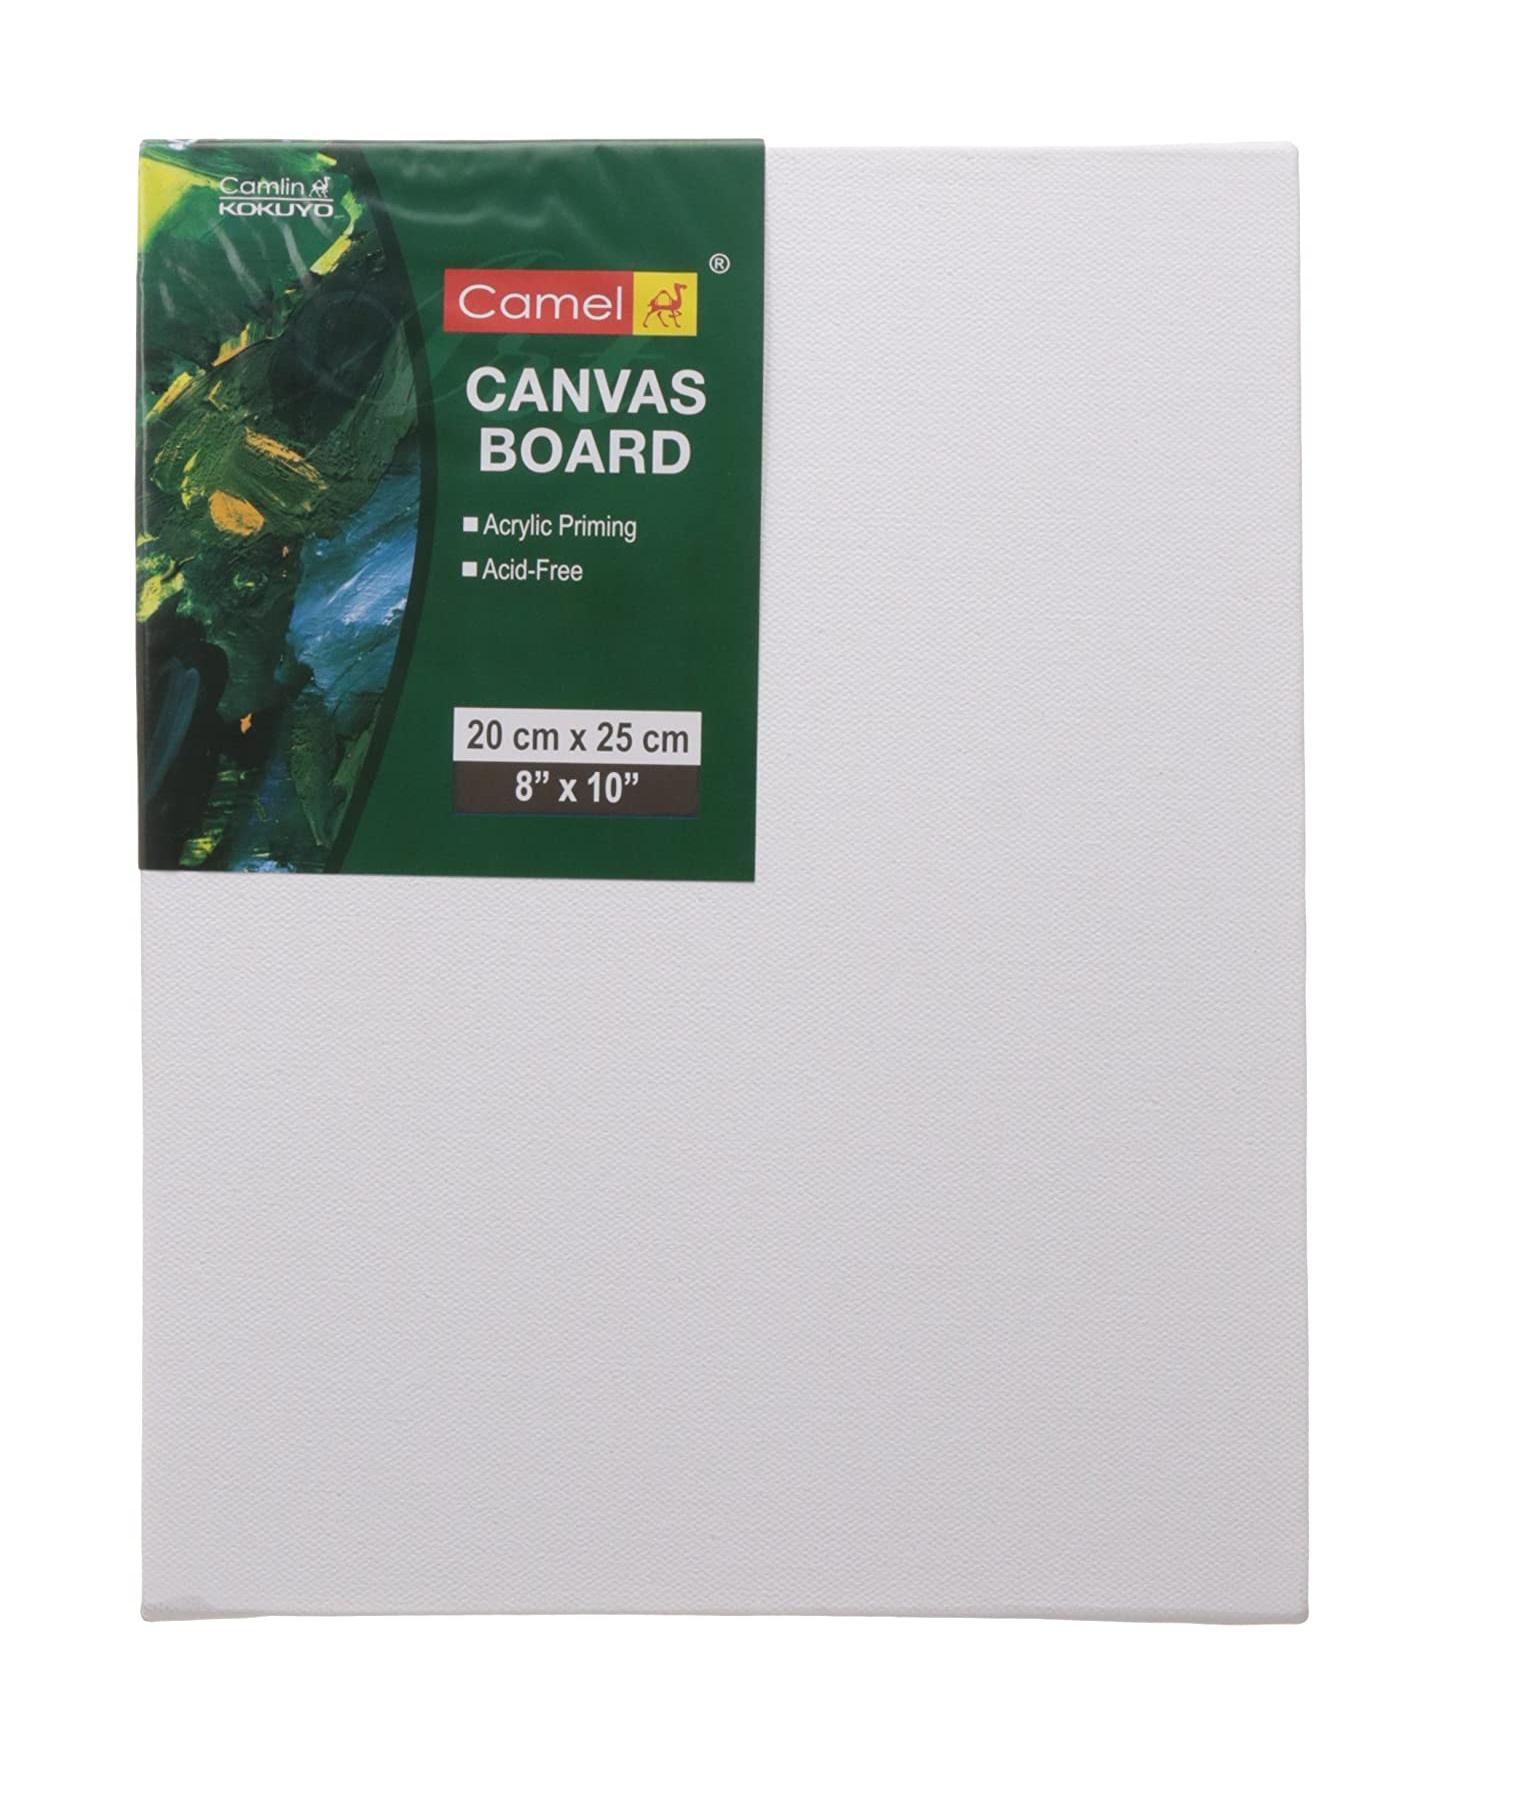 Camlin Kokuyo Canvas Board - 20cm x 25cm